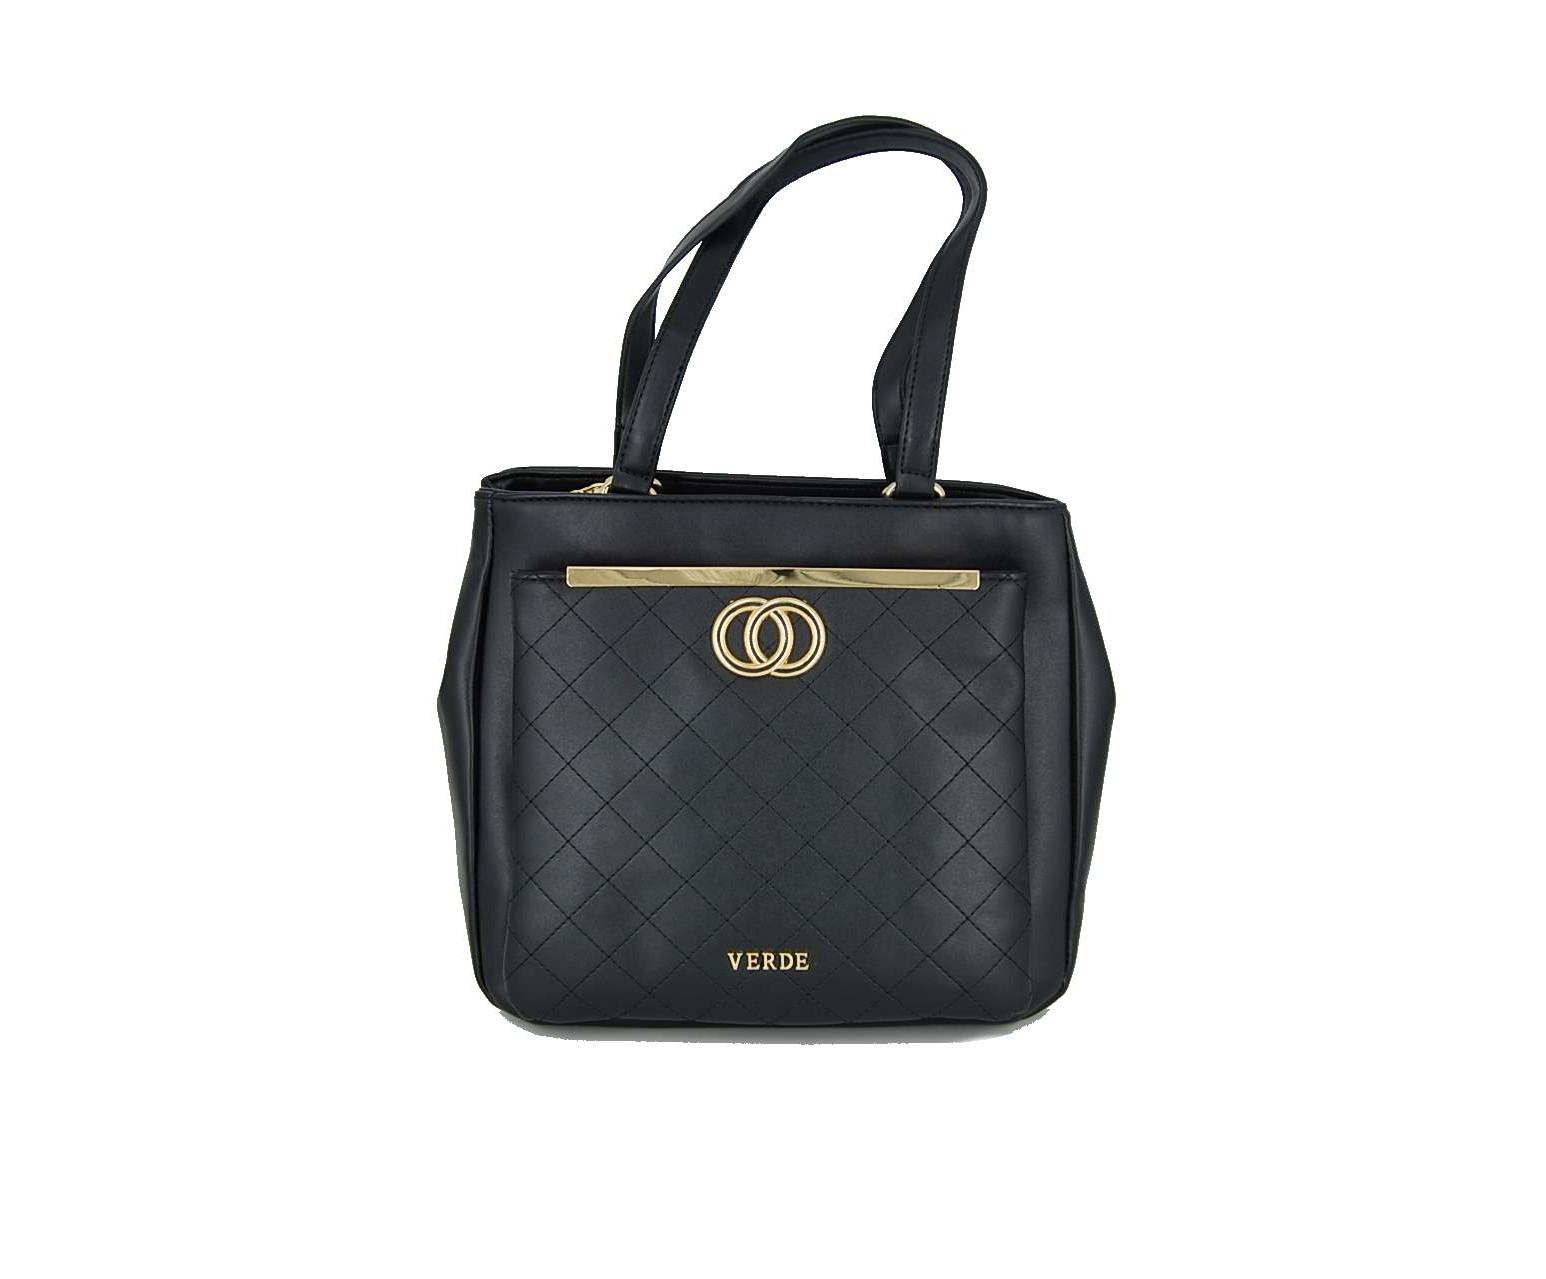 1b795fded5 Verde τσάντα γυναικεία ώμου μαύρη